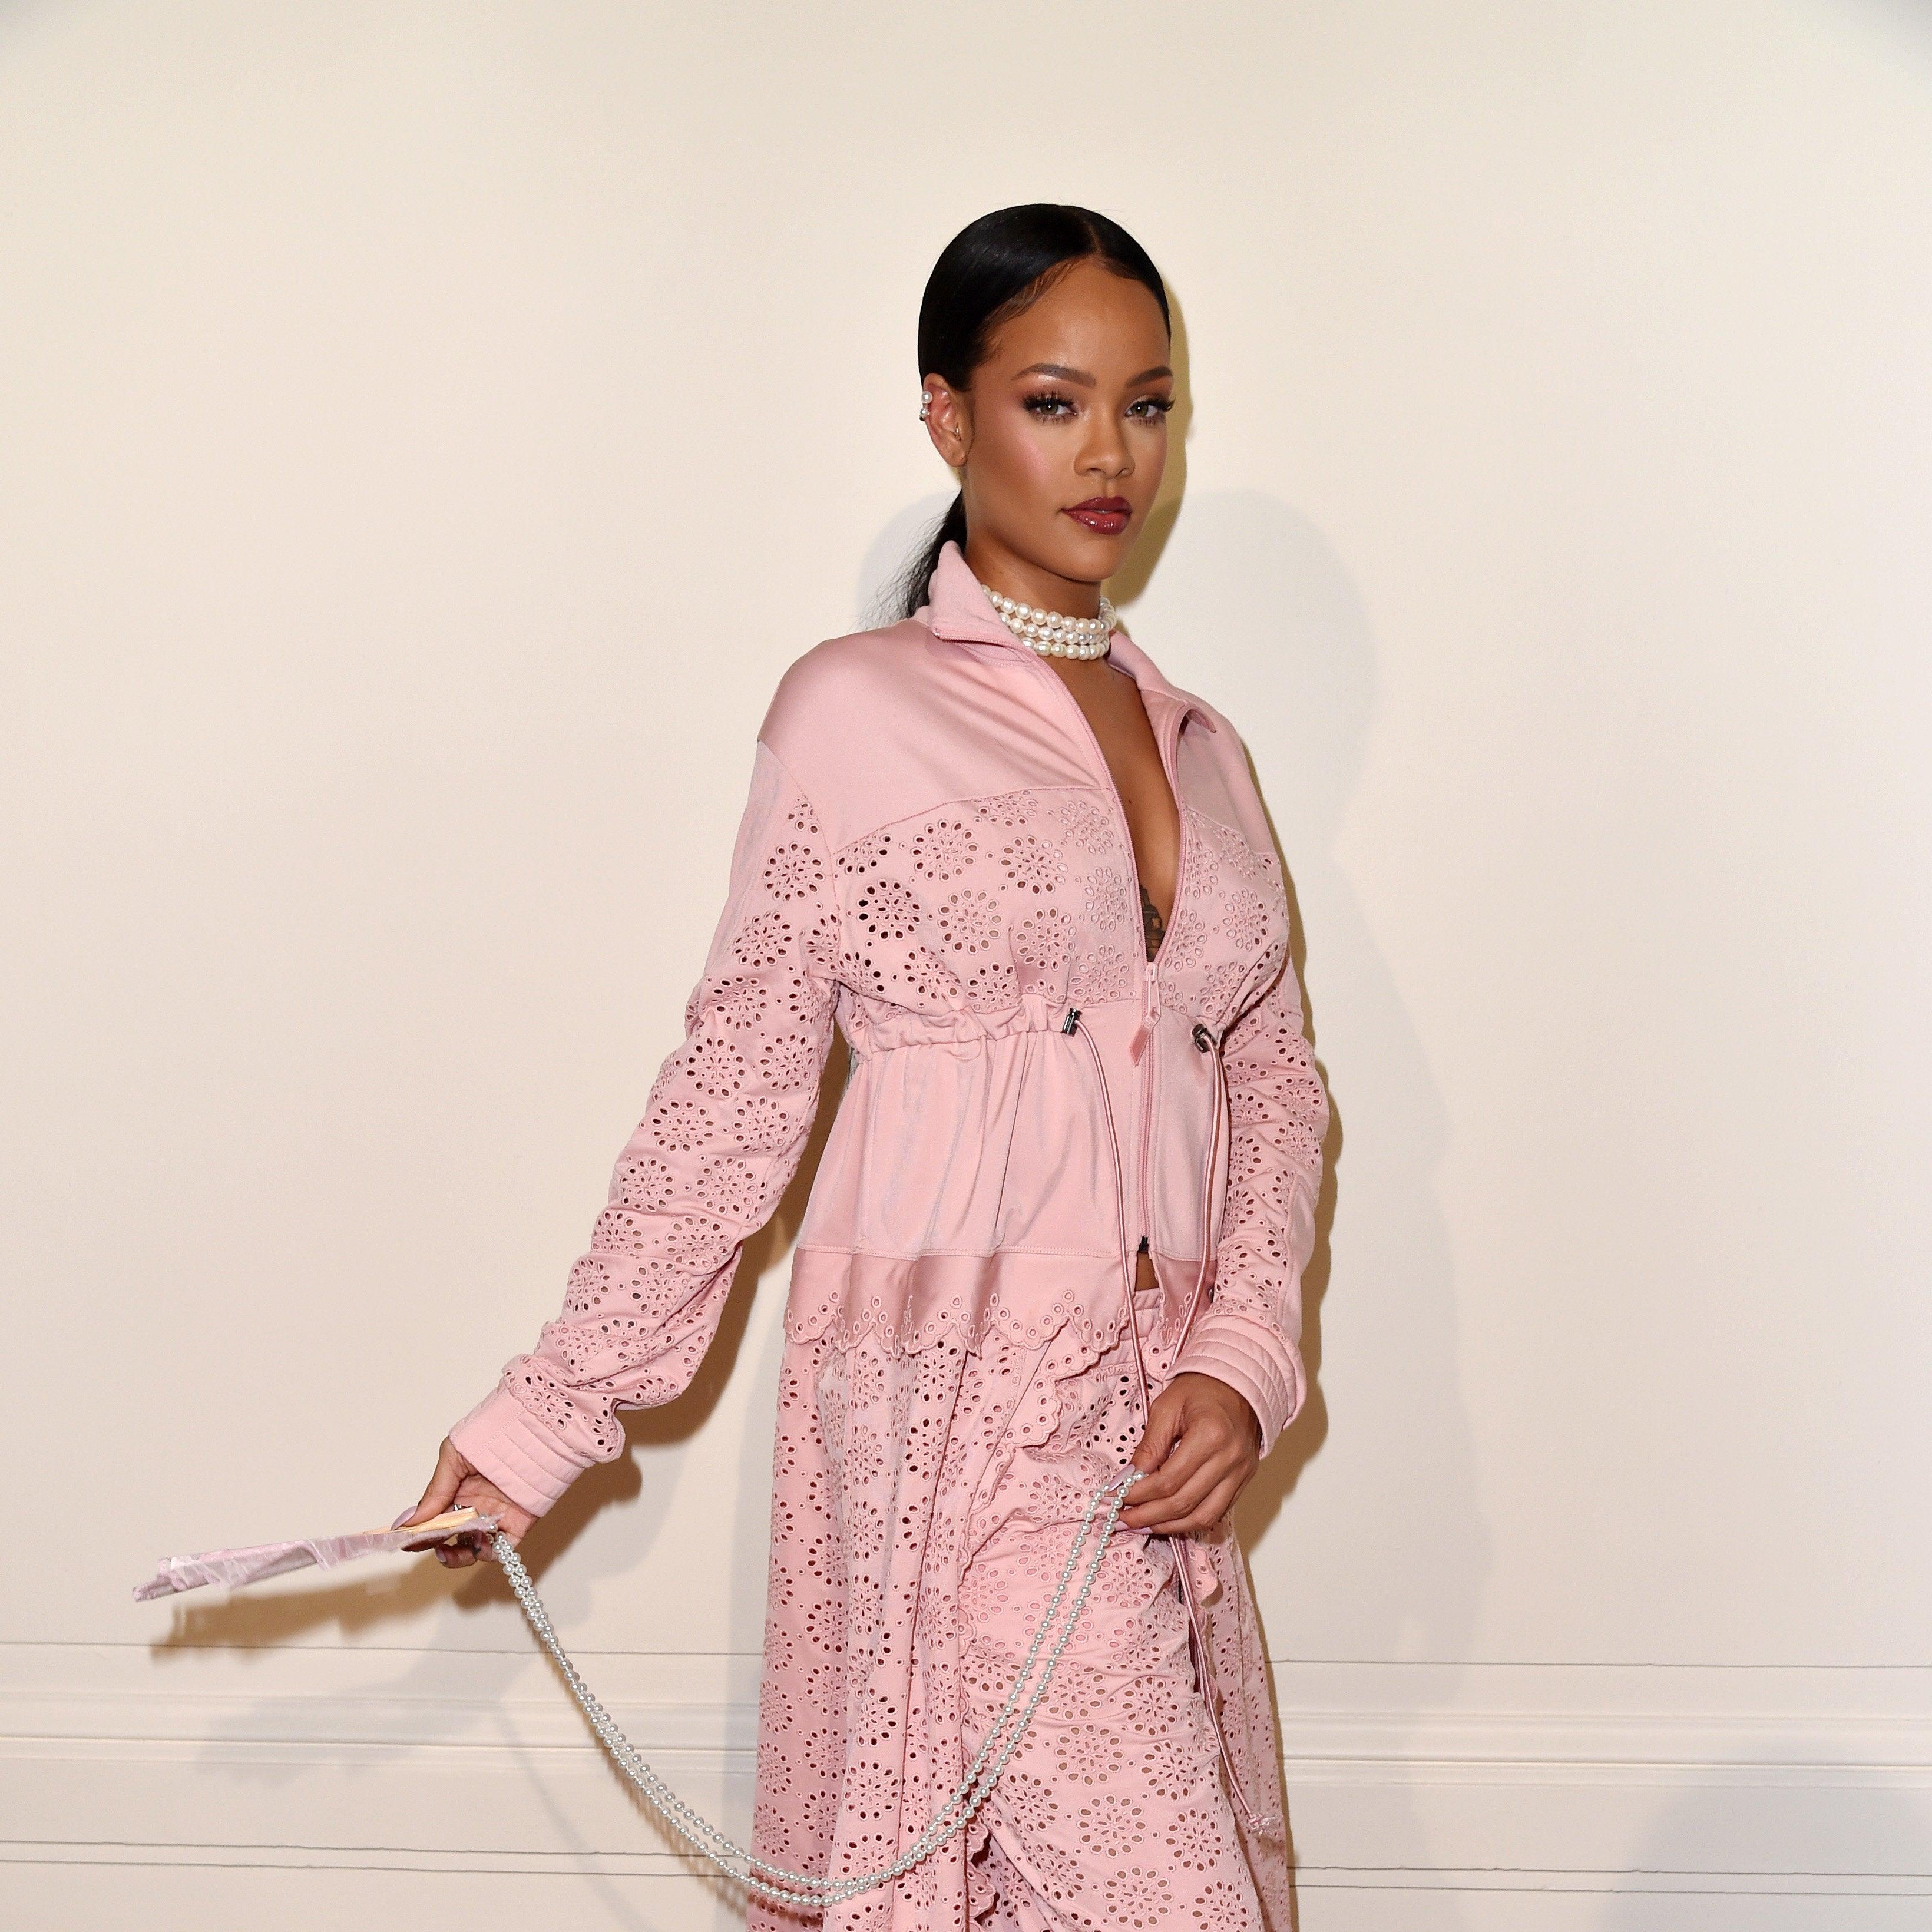 Rihanna, Lupita Nyong'o and Jourdan Dunn's Style Made Us Do a Double Take This Week